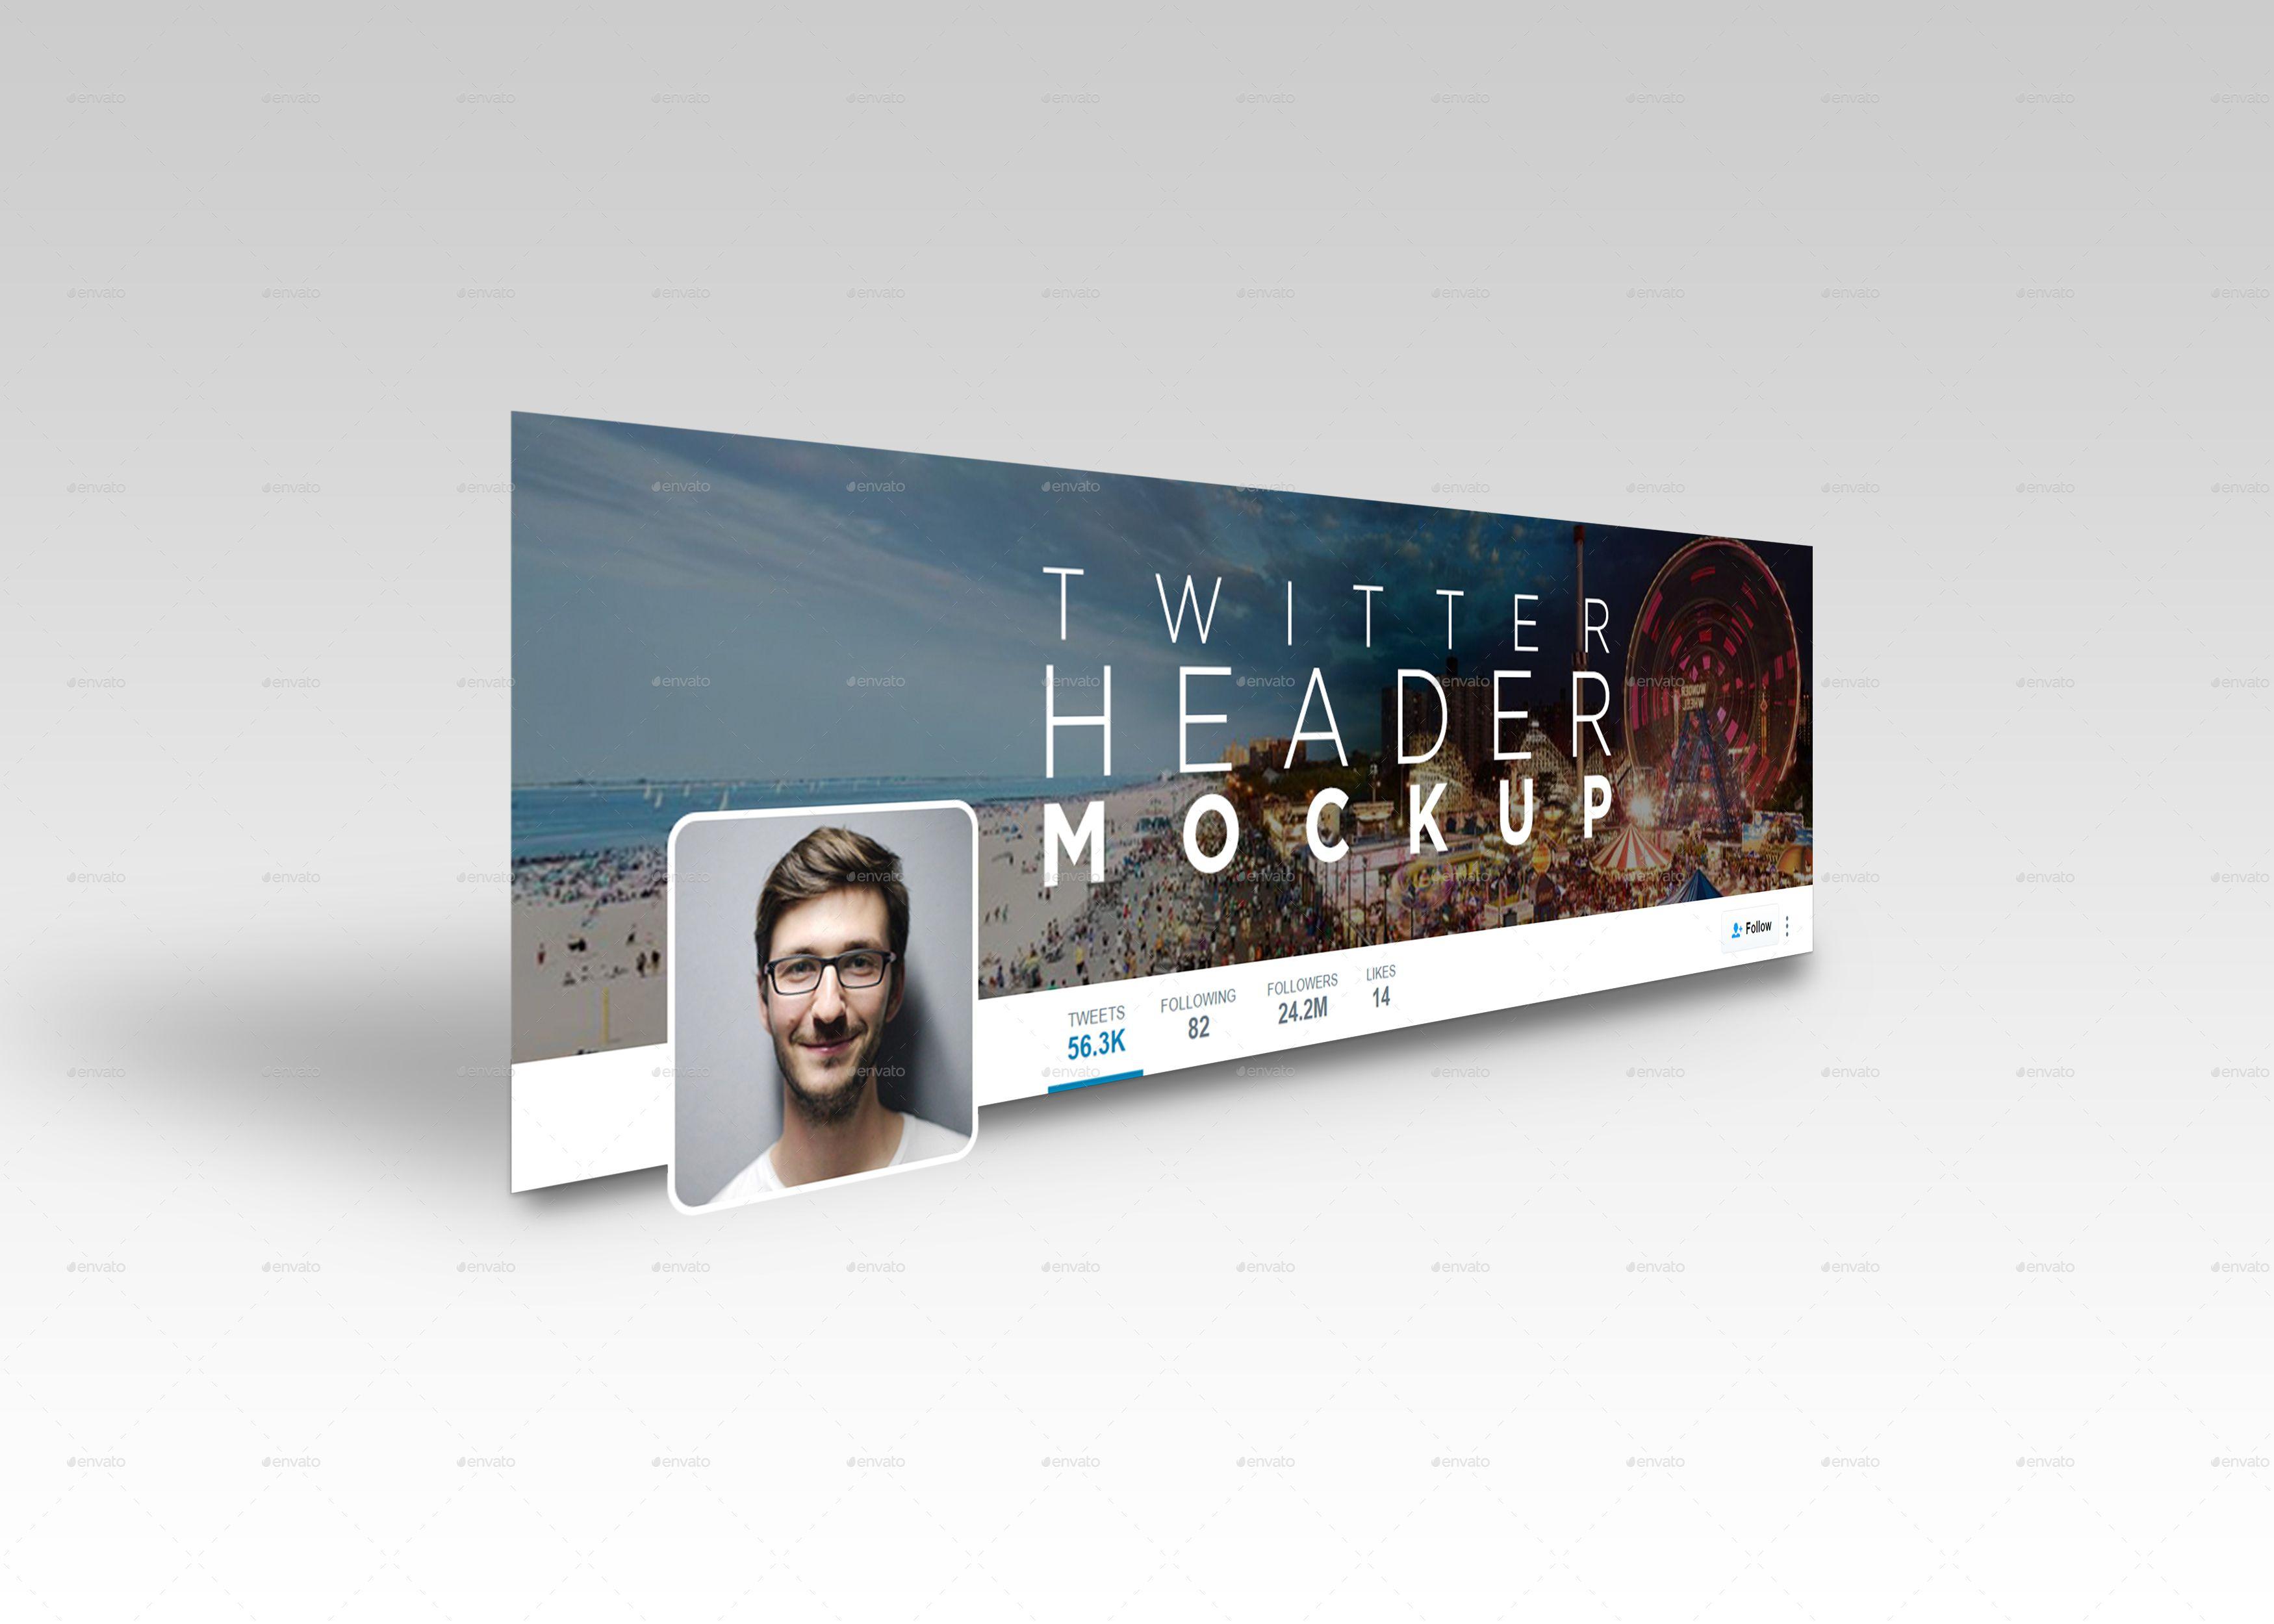 Twitter Header Mockup Twitter Header Header Mockup